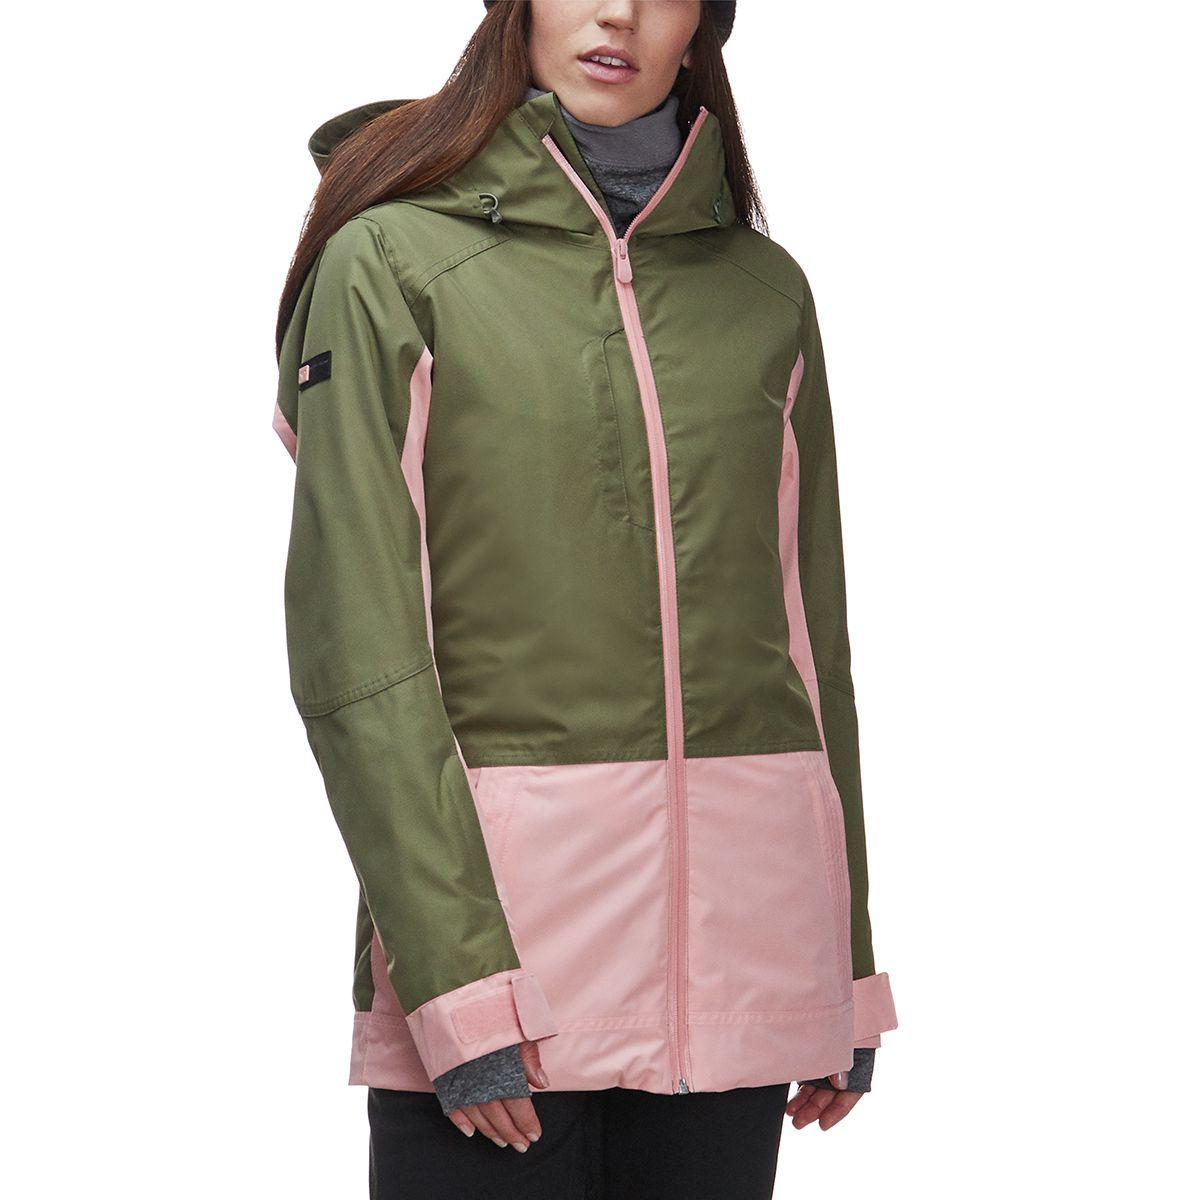 Roxy Torah Bright Snowflake Insulated Jacket - Women's